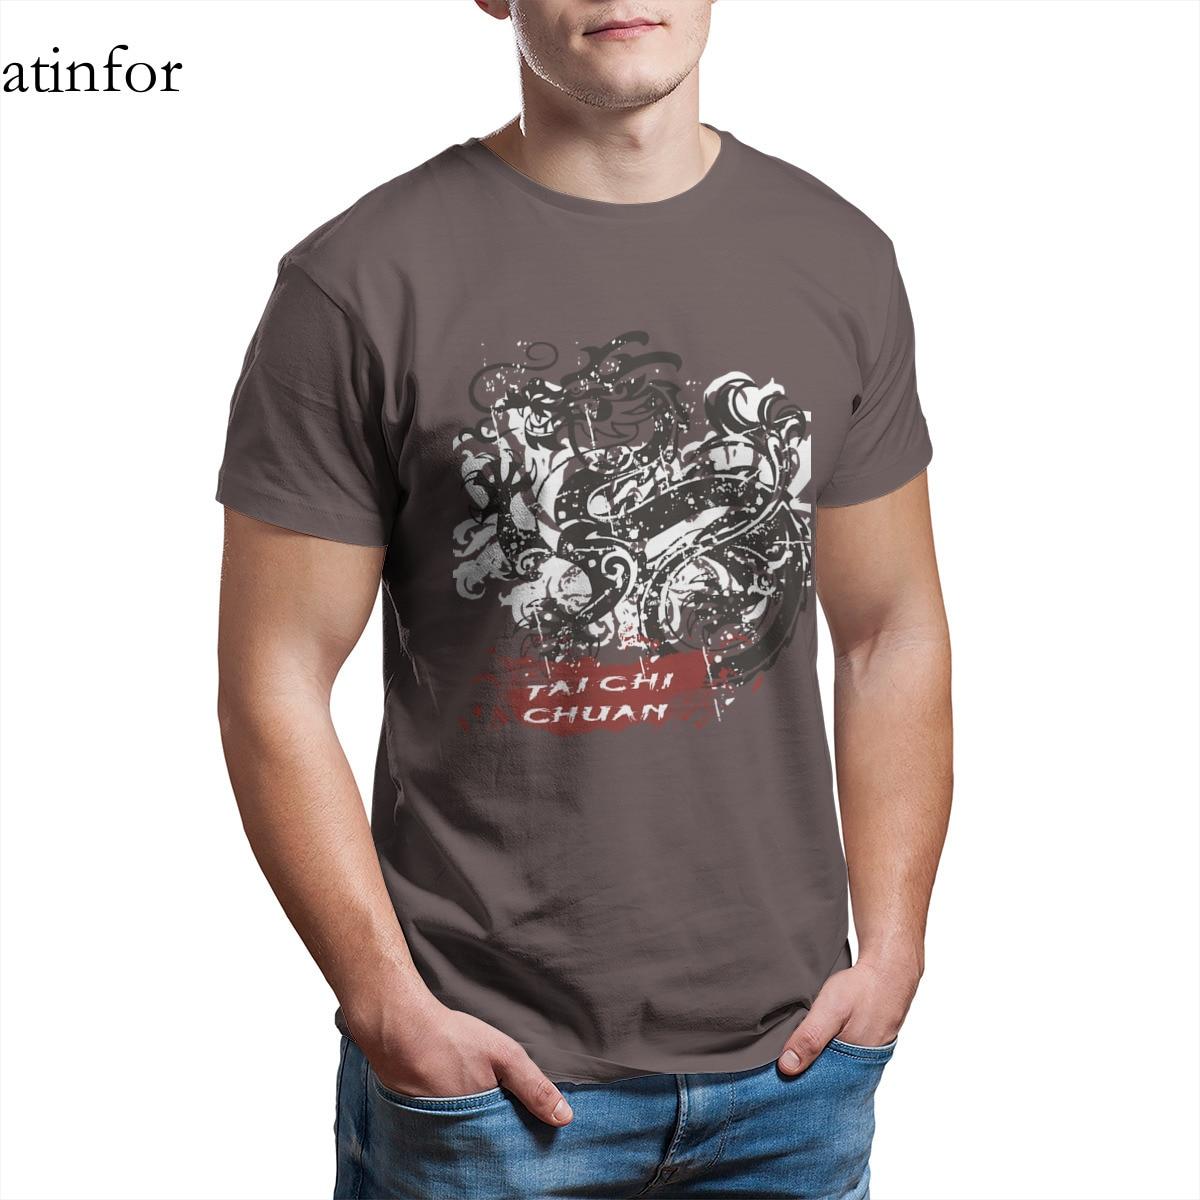 Крутая футболка Tai Chi Chuan, забавная черная футболка на заказ для косплея 4XL 5XL 6XL, 17477|Футболки| | АлиЭкспресс